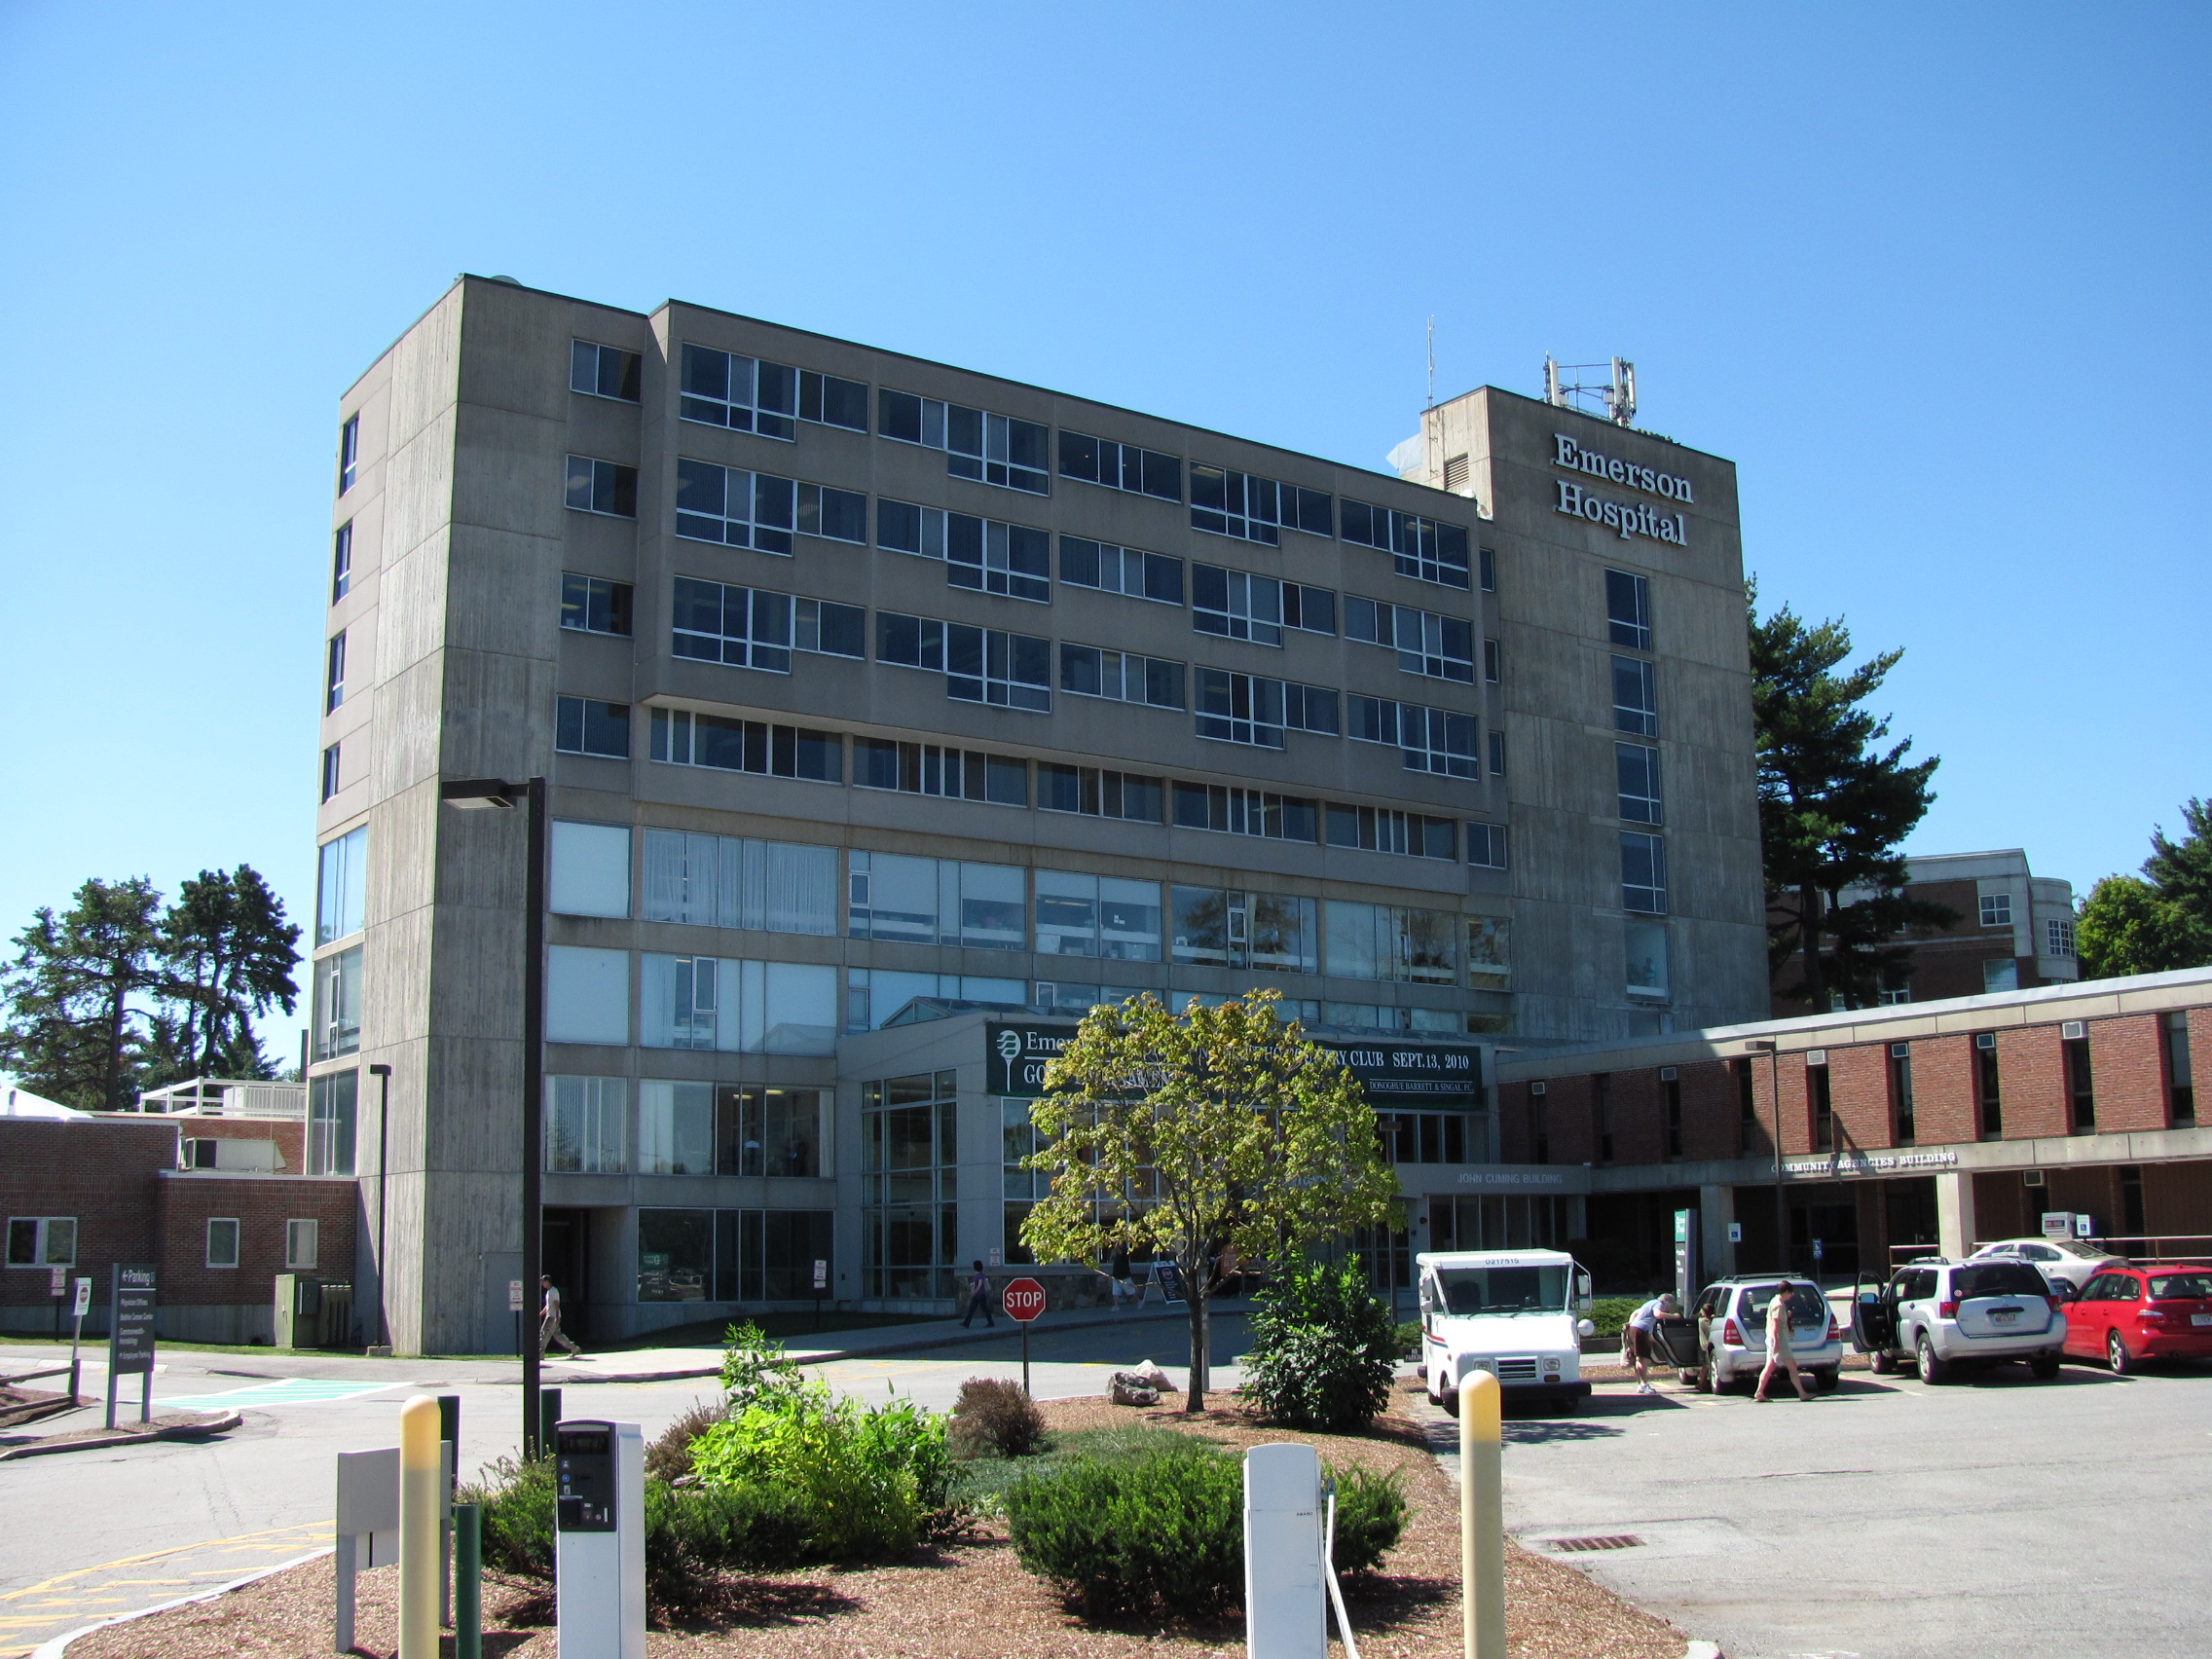 Emerson Hospital - Wikipedia